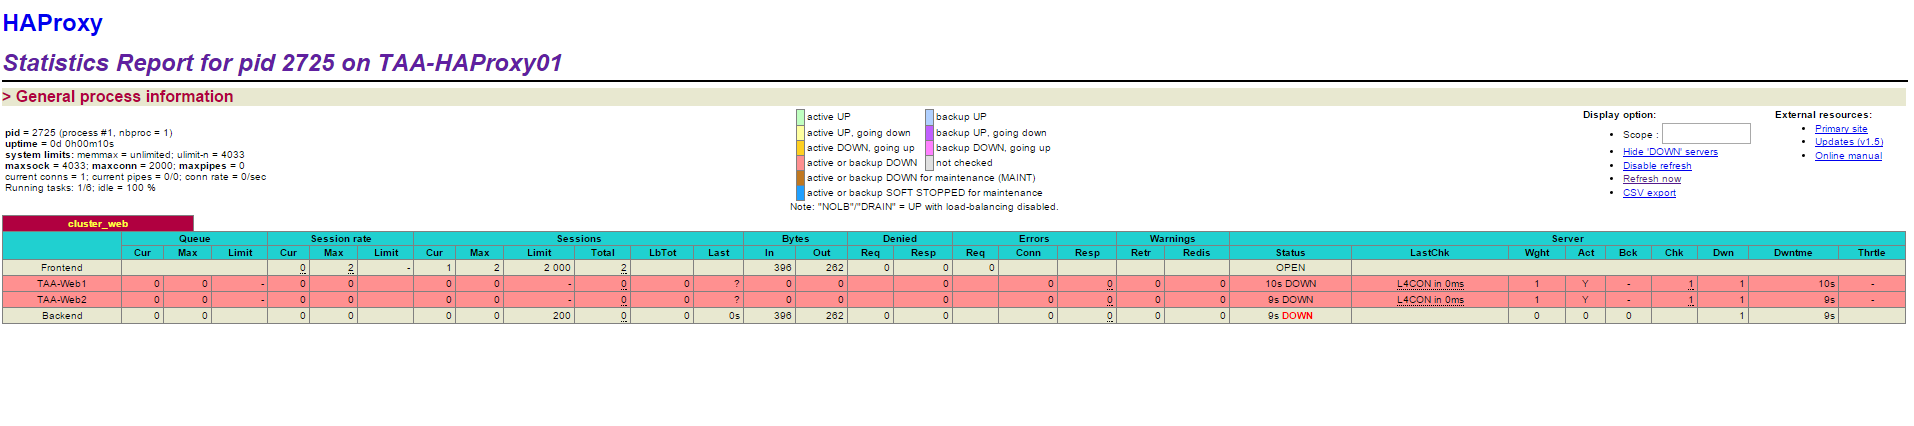 Configure a Proxy HA on Cloudstack - EN Ikoula wiki